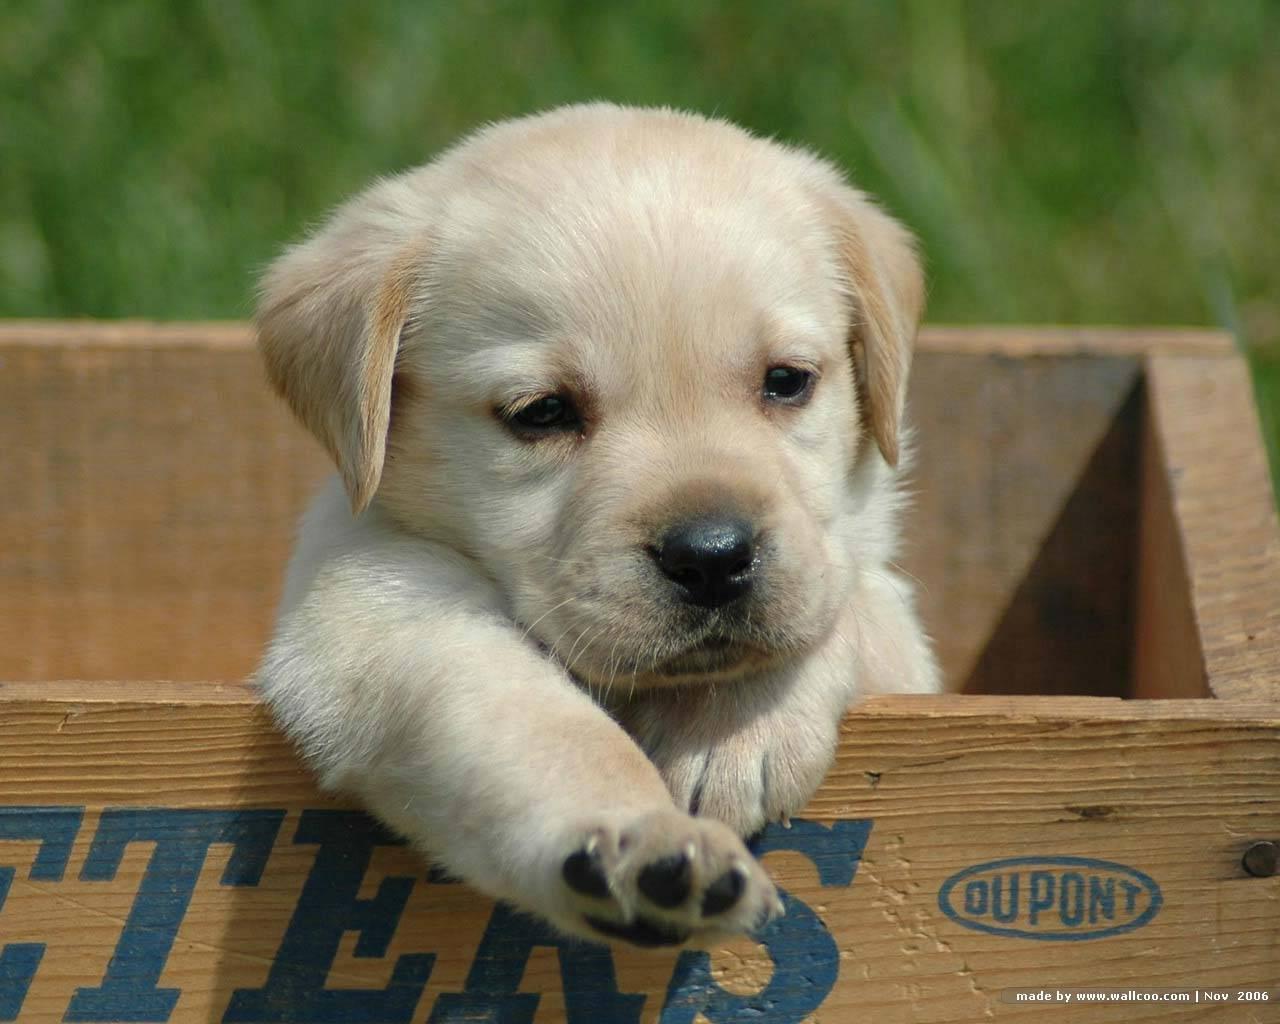 wallpaperscomwallpaperbaby dog of labrador retriever w1663html 1280x1024